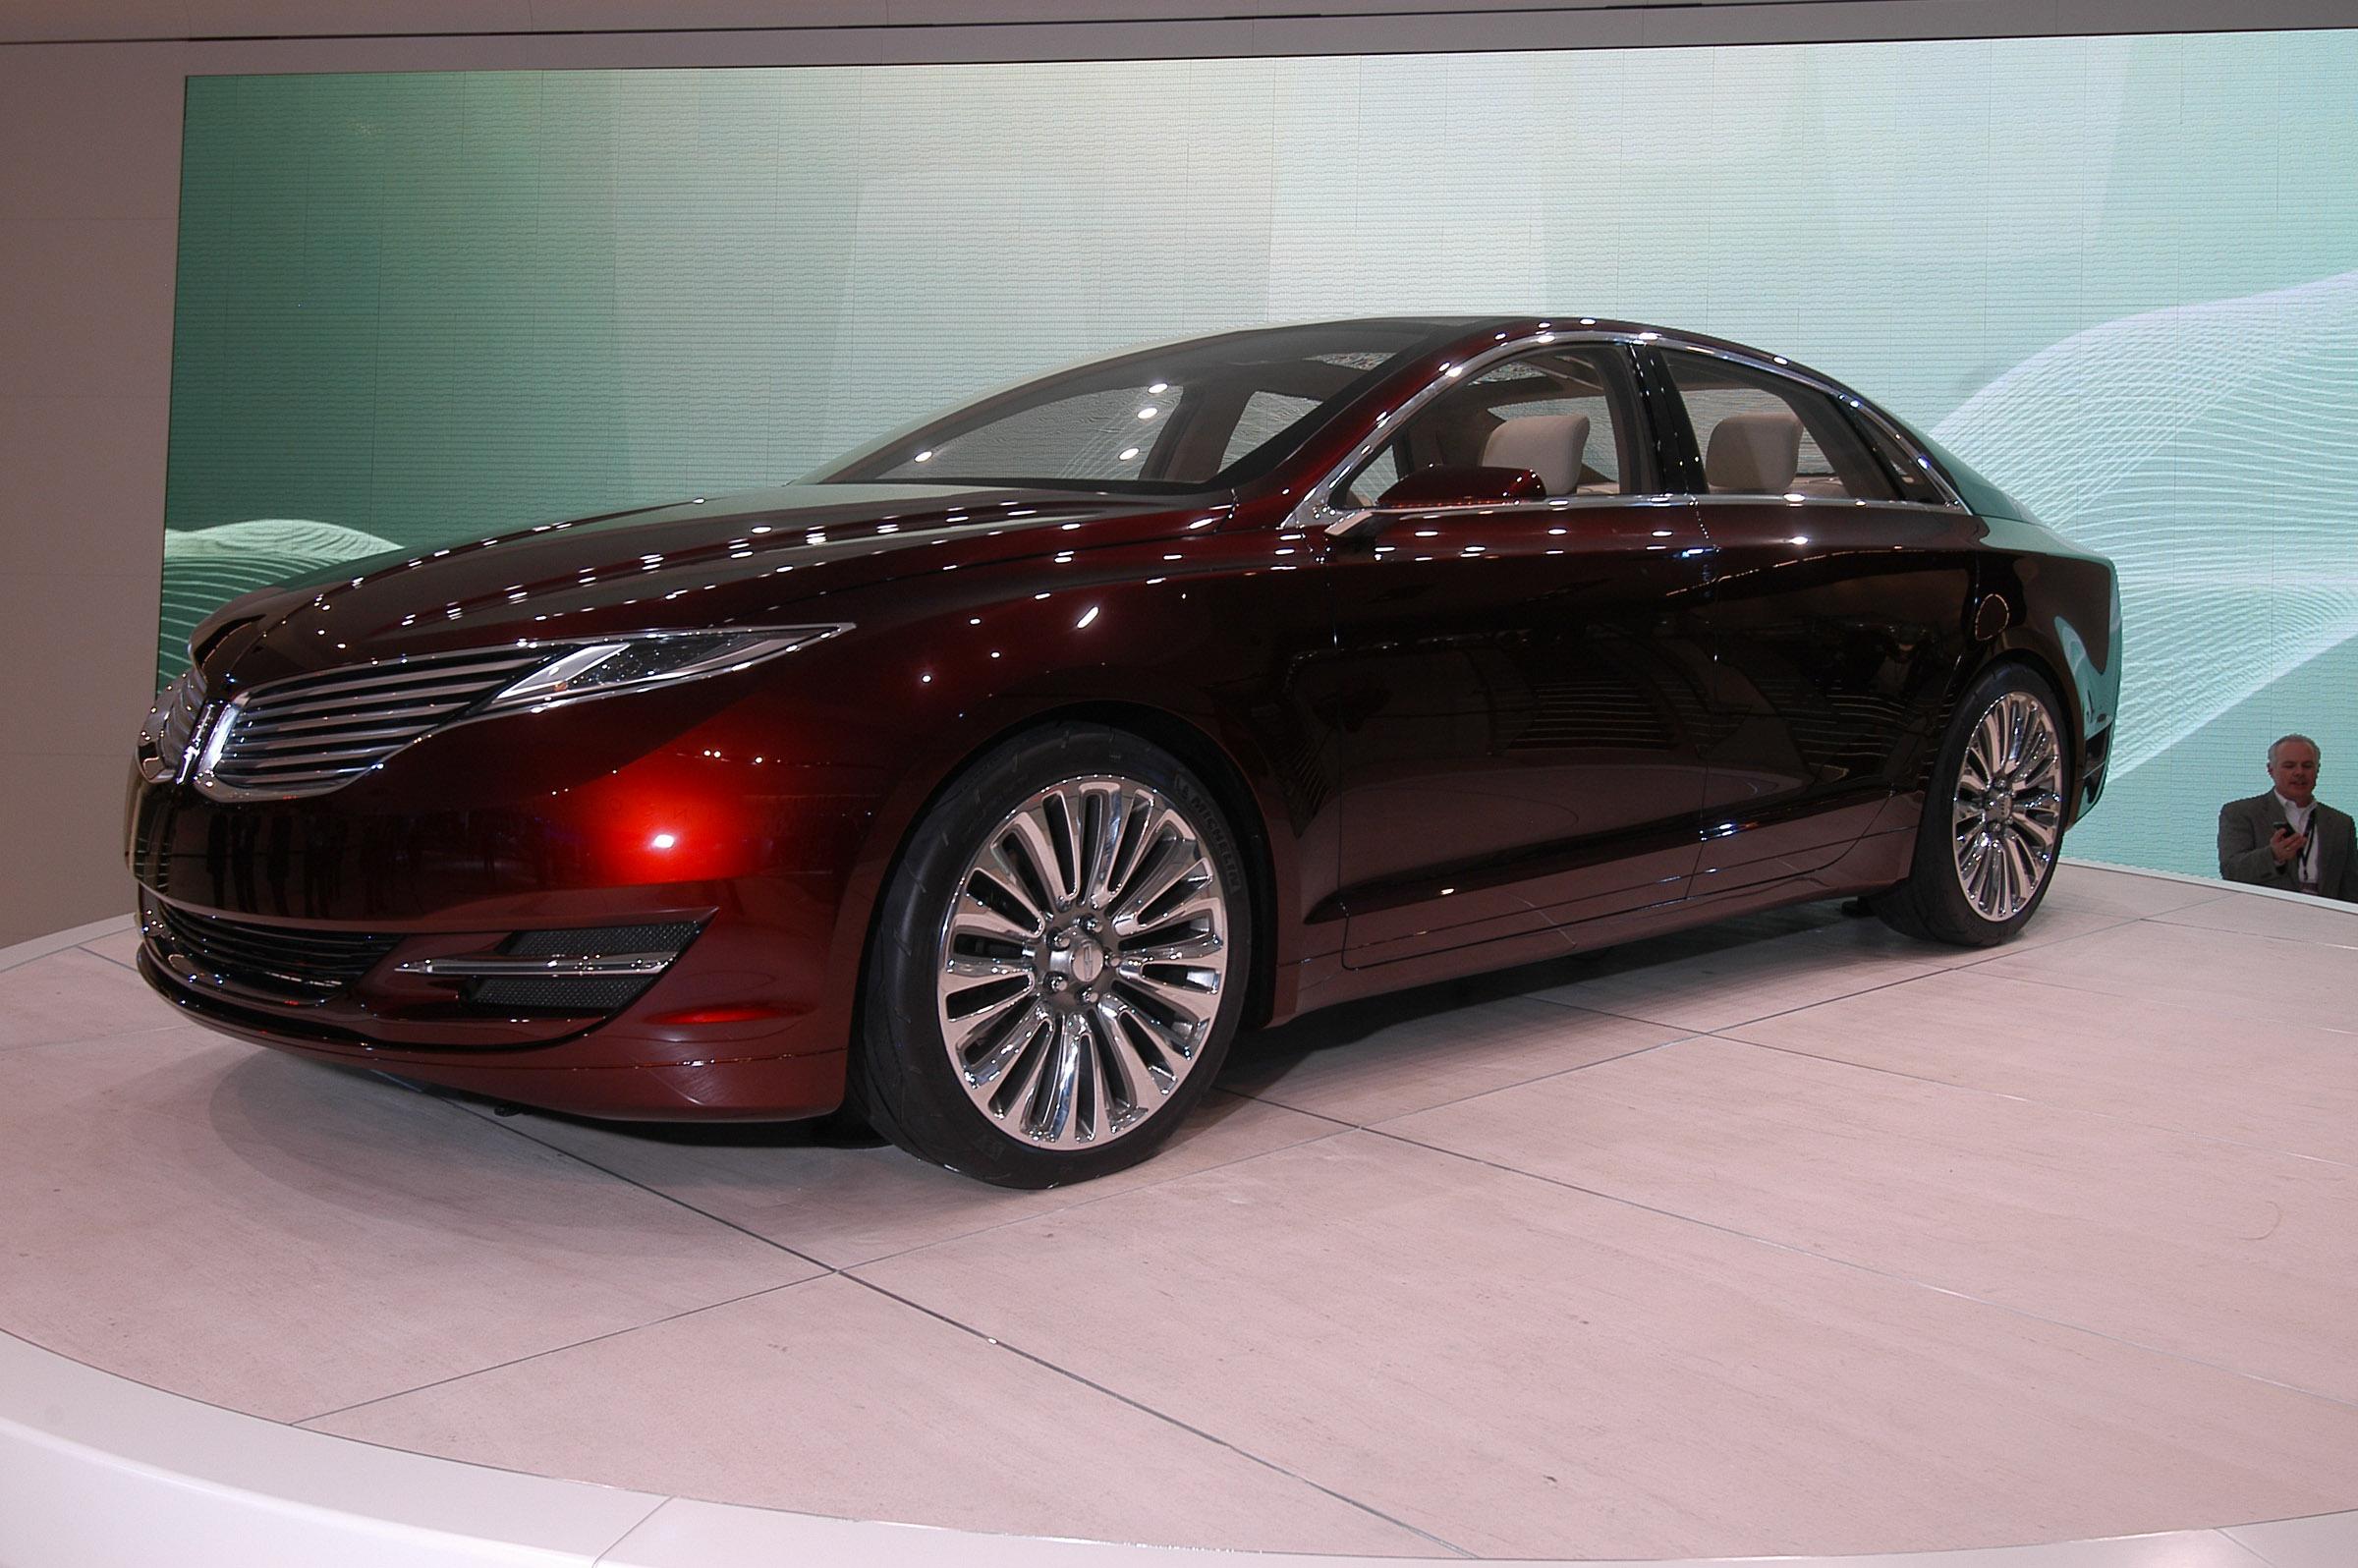 https://www.automobilesreview.com/gallery/lincoln-mkz-concept-detroit-2012/lincoln-mkz-concept-detroit-2012-02.jpg